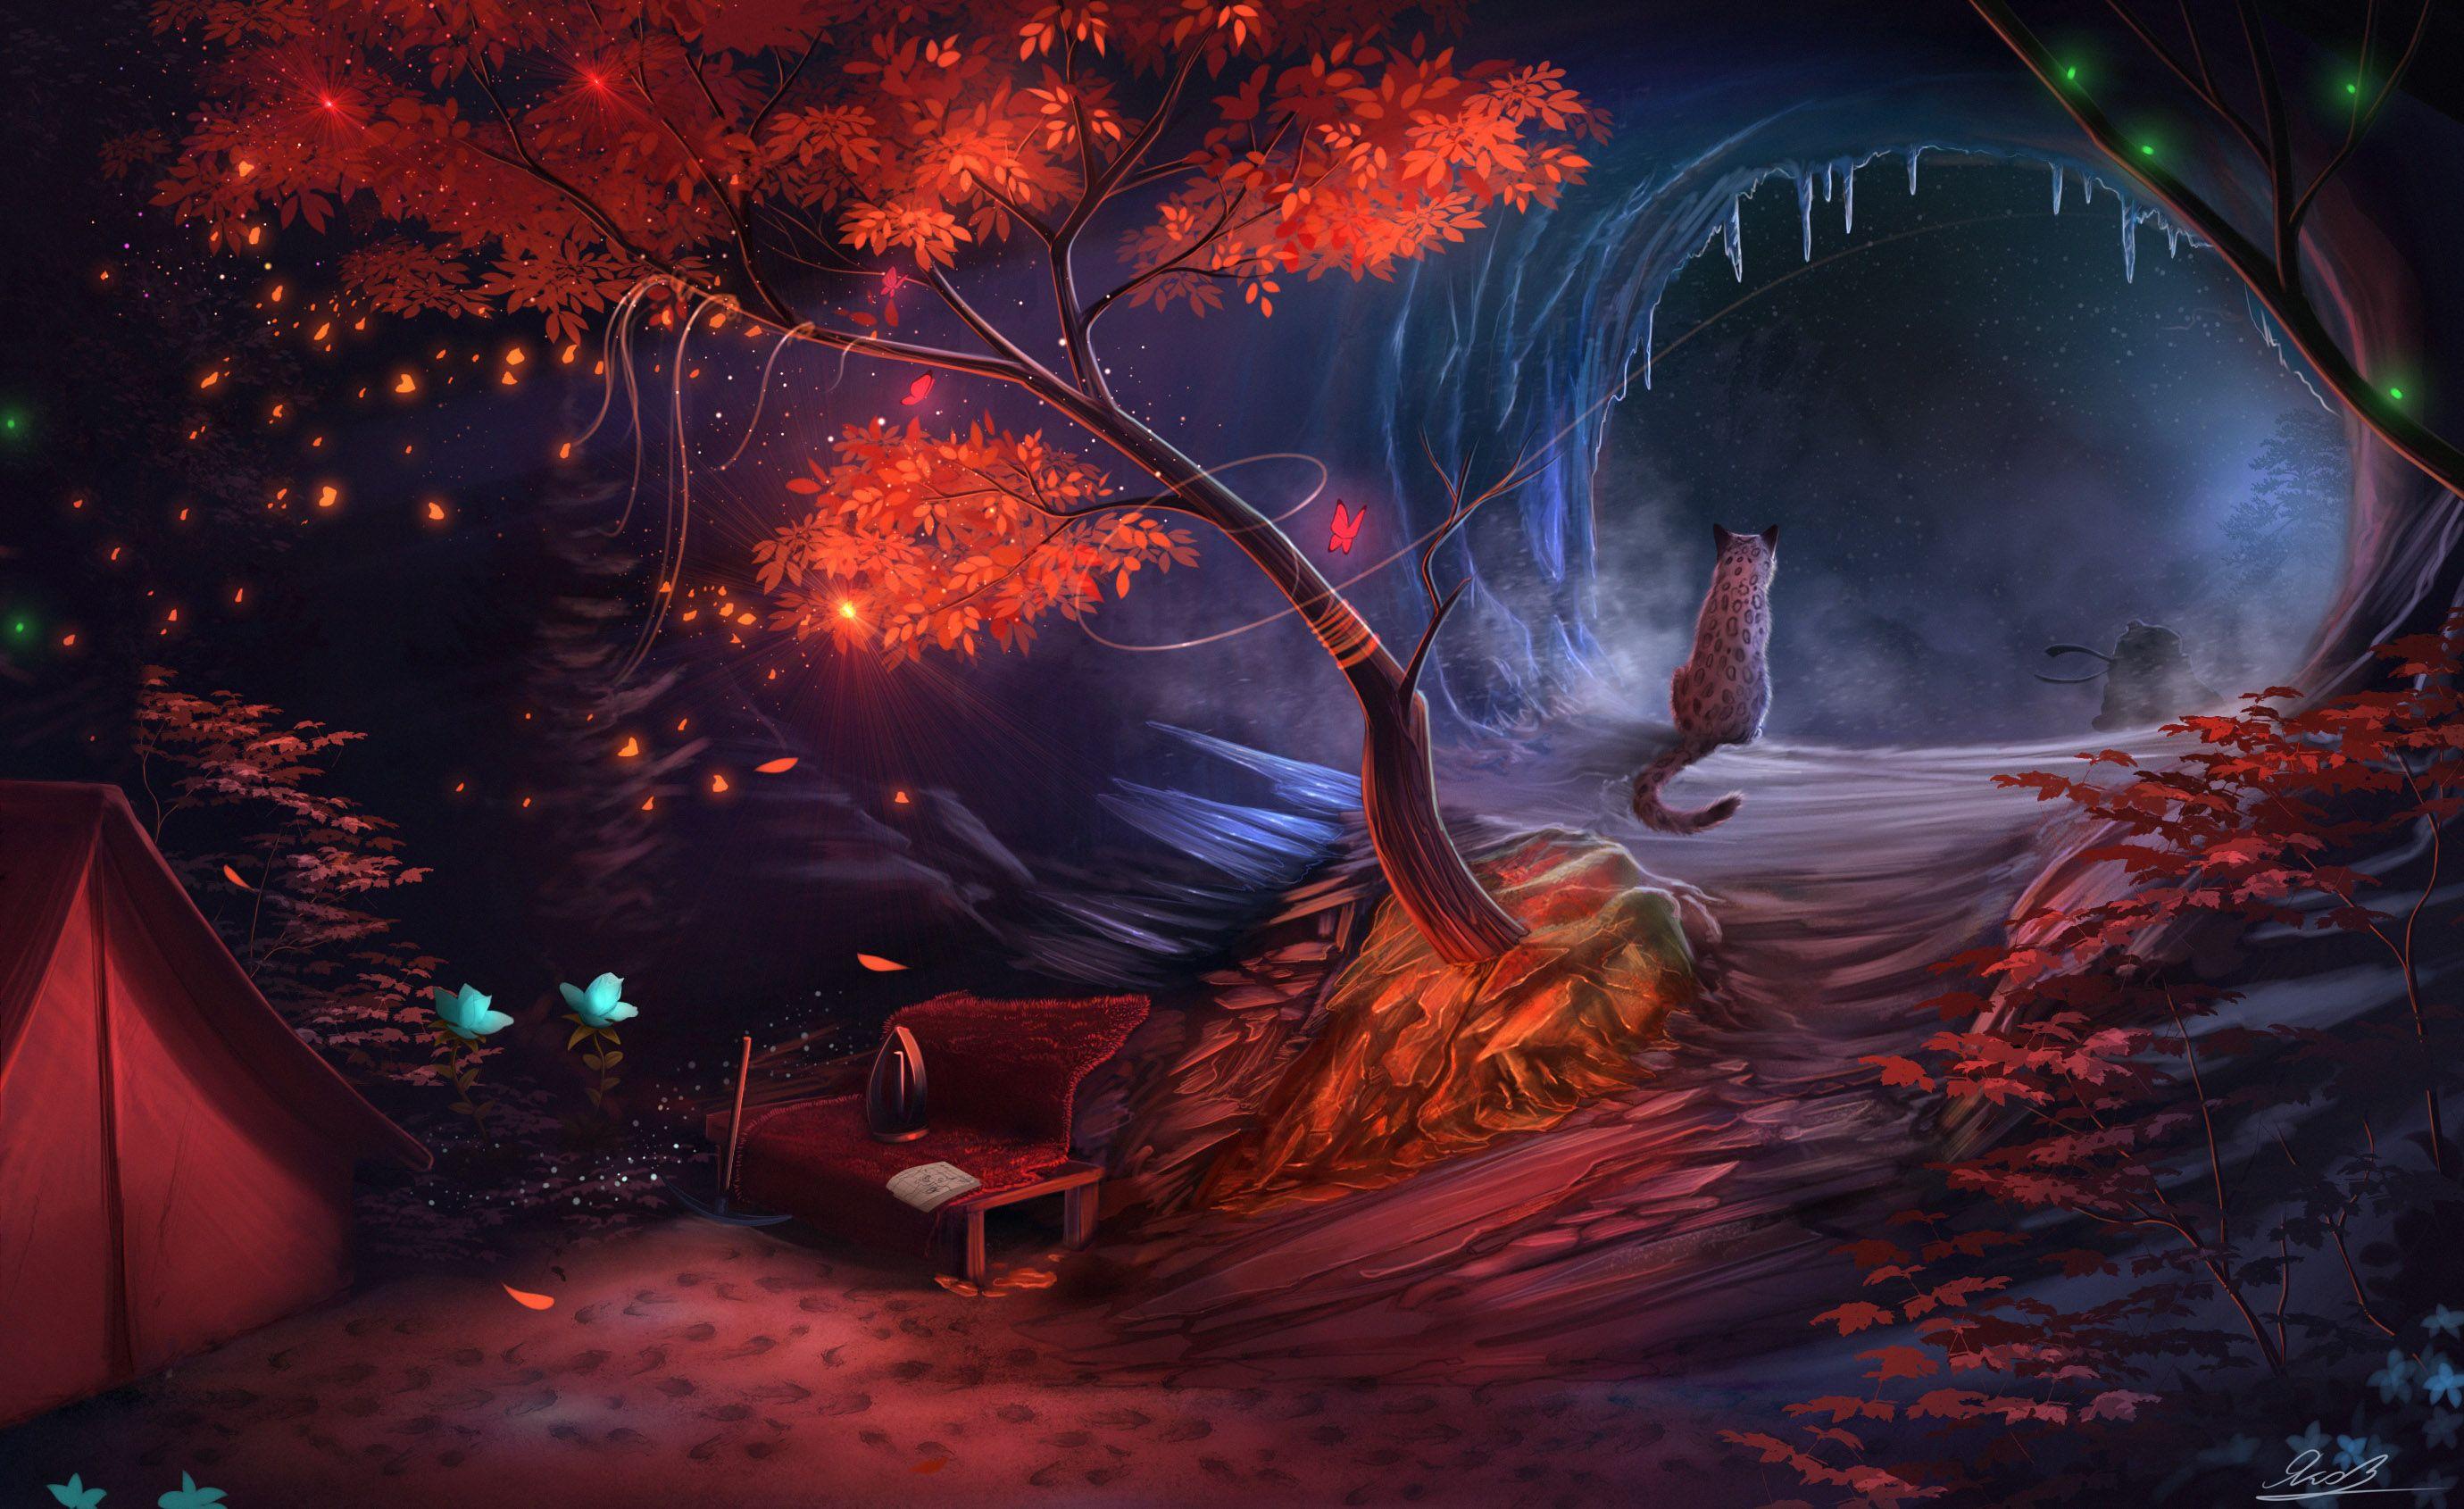 Best Wallpaper Cat Mystical - 03f9922369eac5e9a8948226d8a0357e  Pictures_99254 .jpg